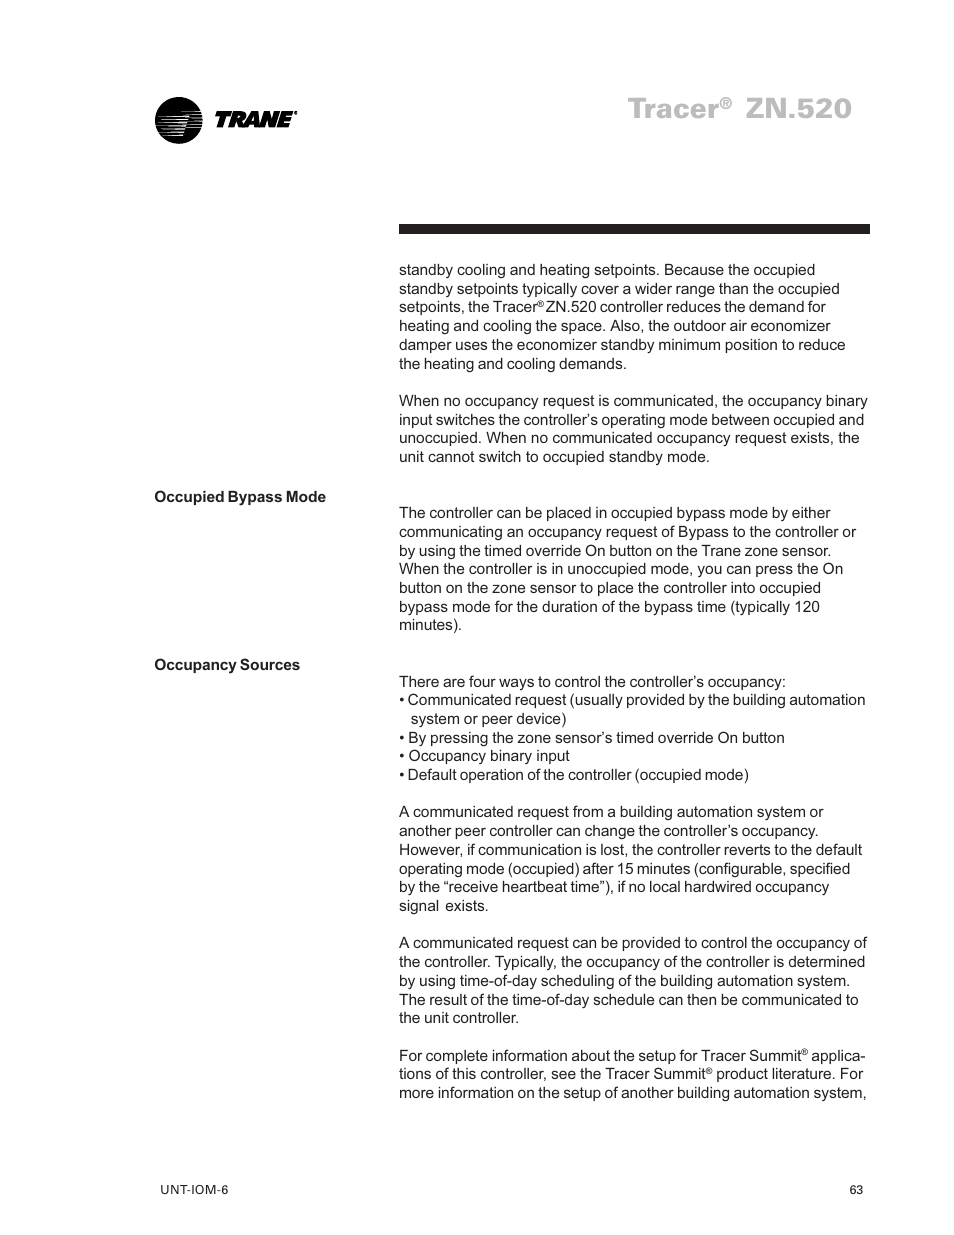 Tracer, Zn 520 | Trane LO User Manual | Page 63 / 136 | Original mode